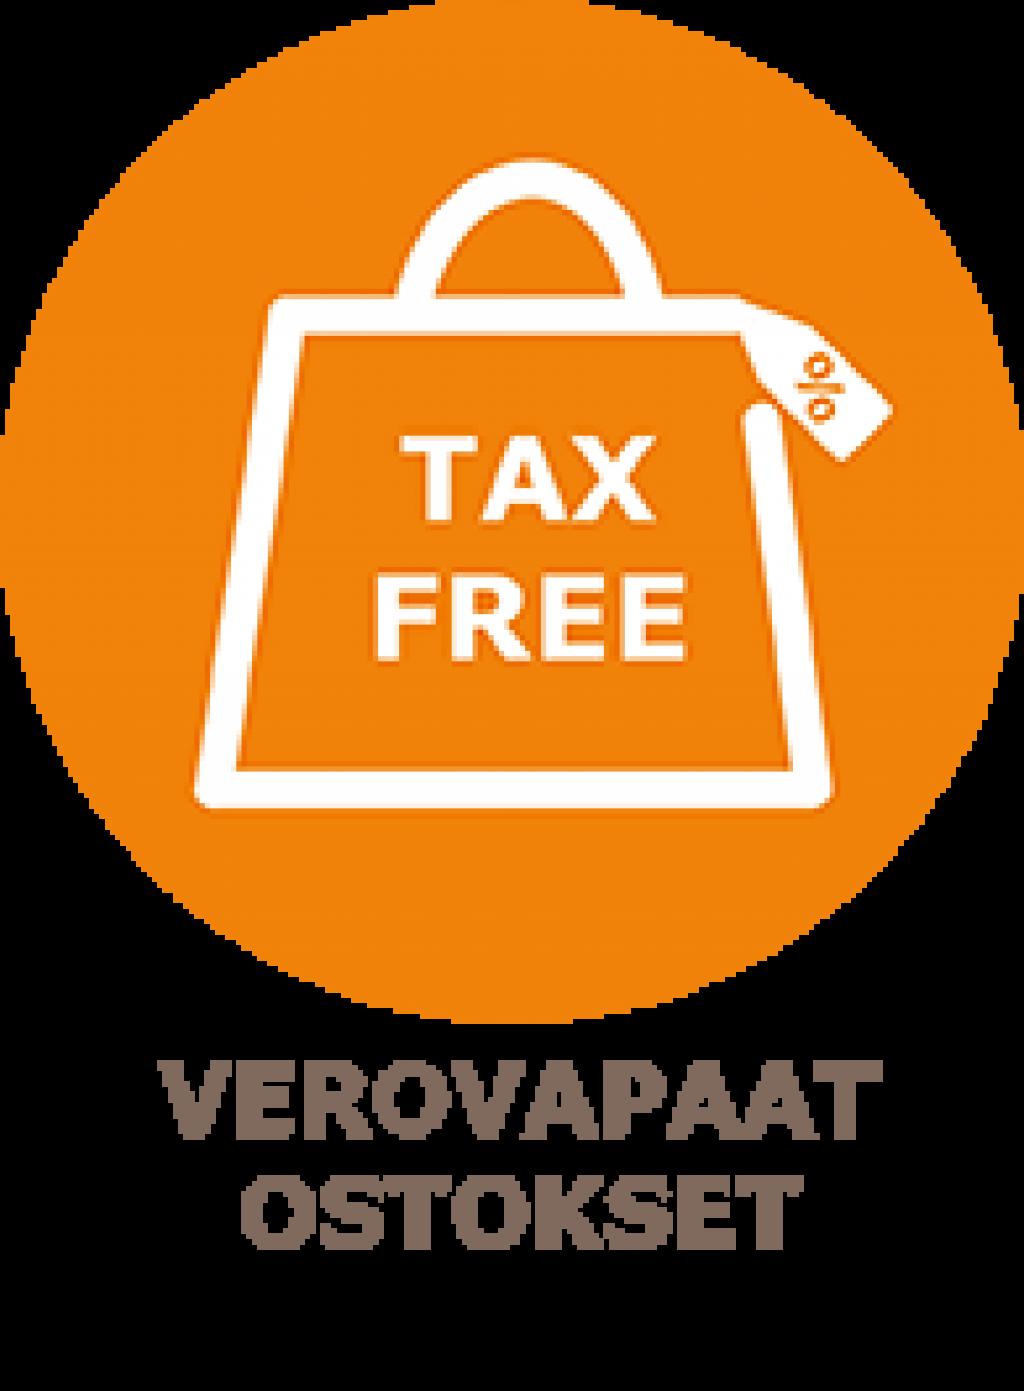 Tax Free Ostokset